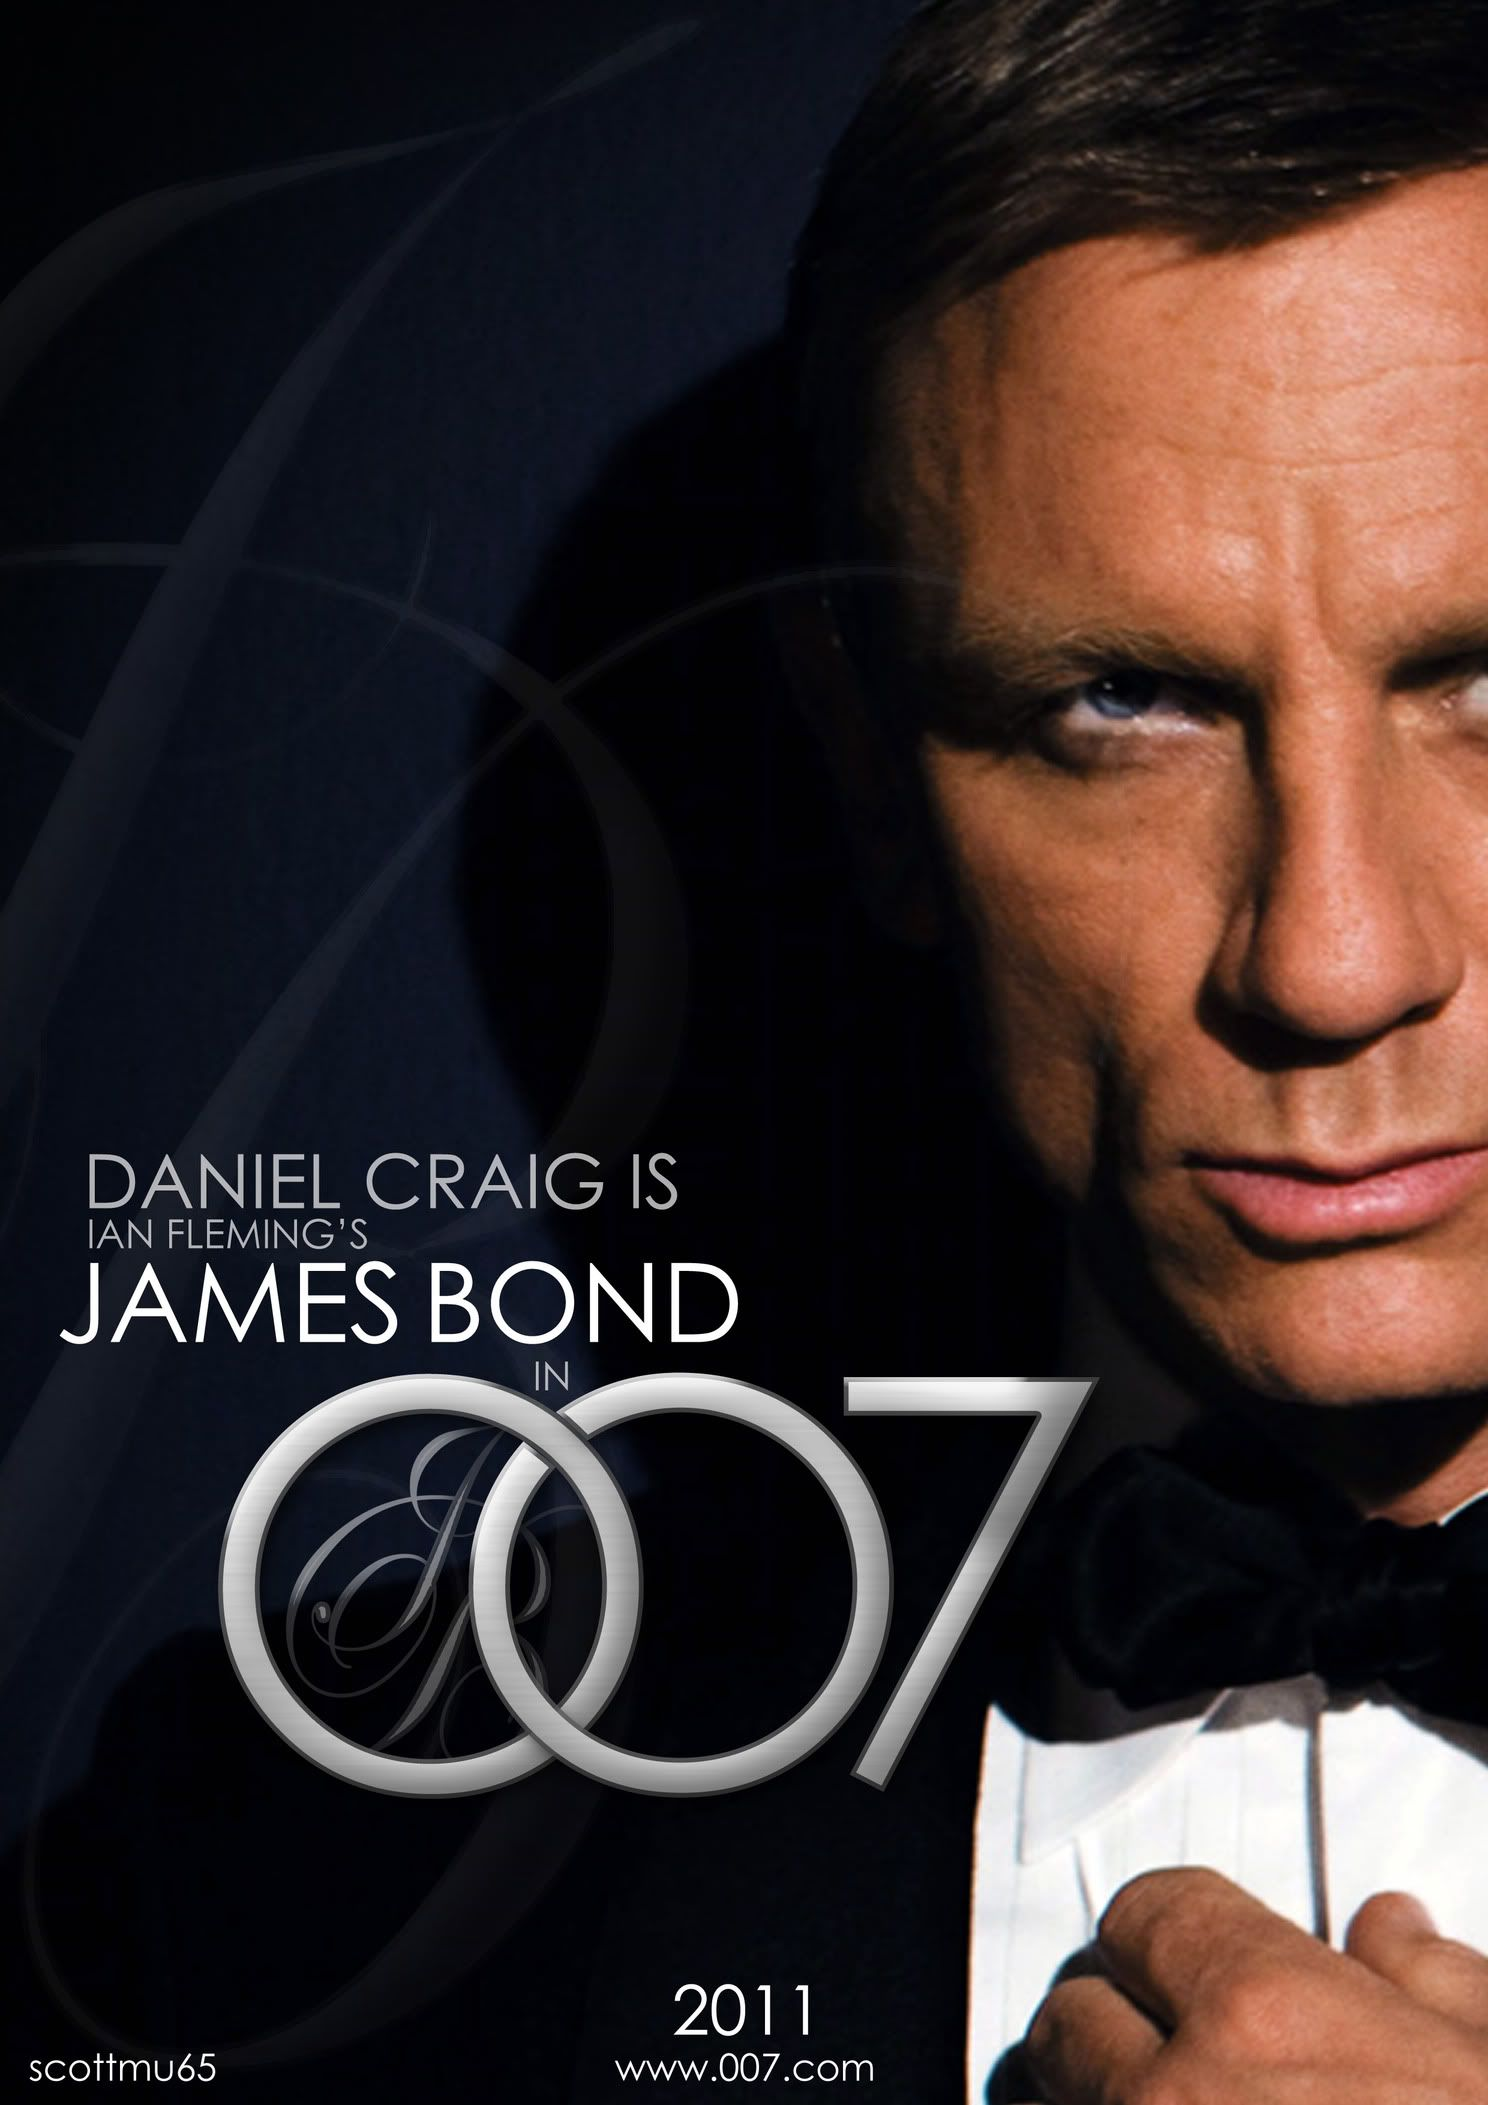 peliculas 007 de daniel craig